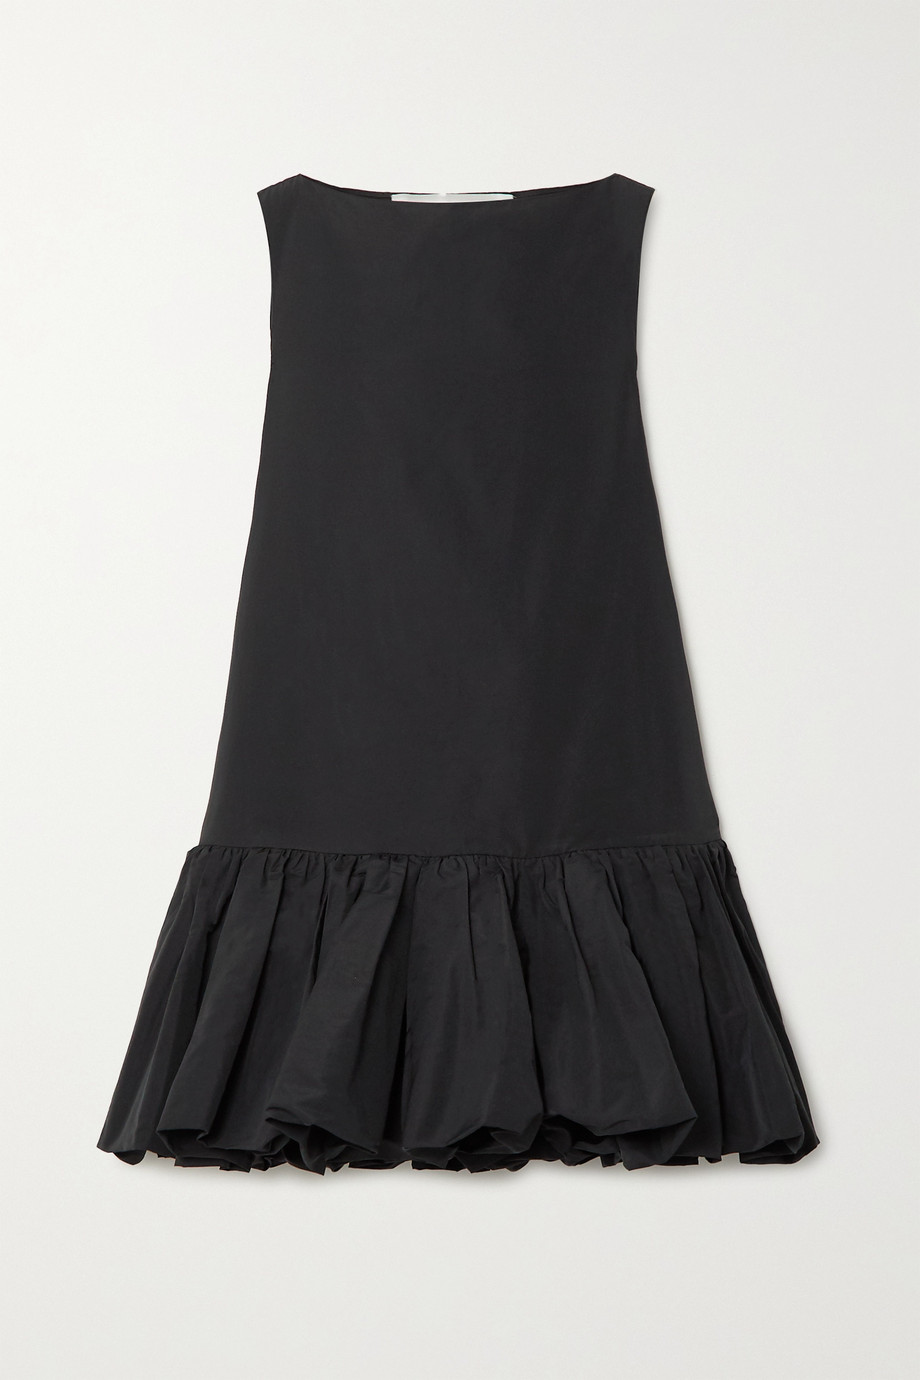 Valentino 棉质混纺罗缎迷你连衣裙